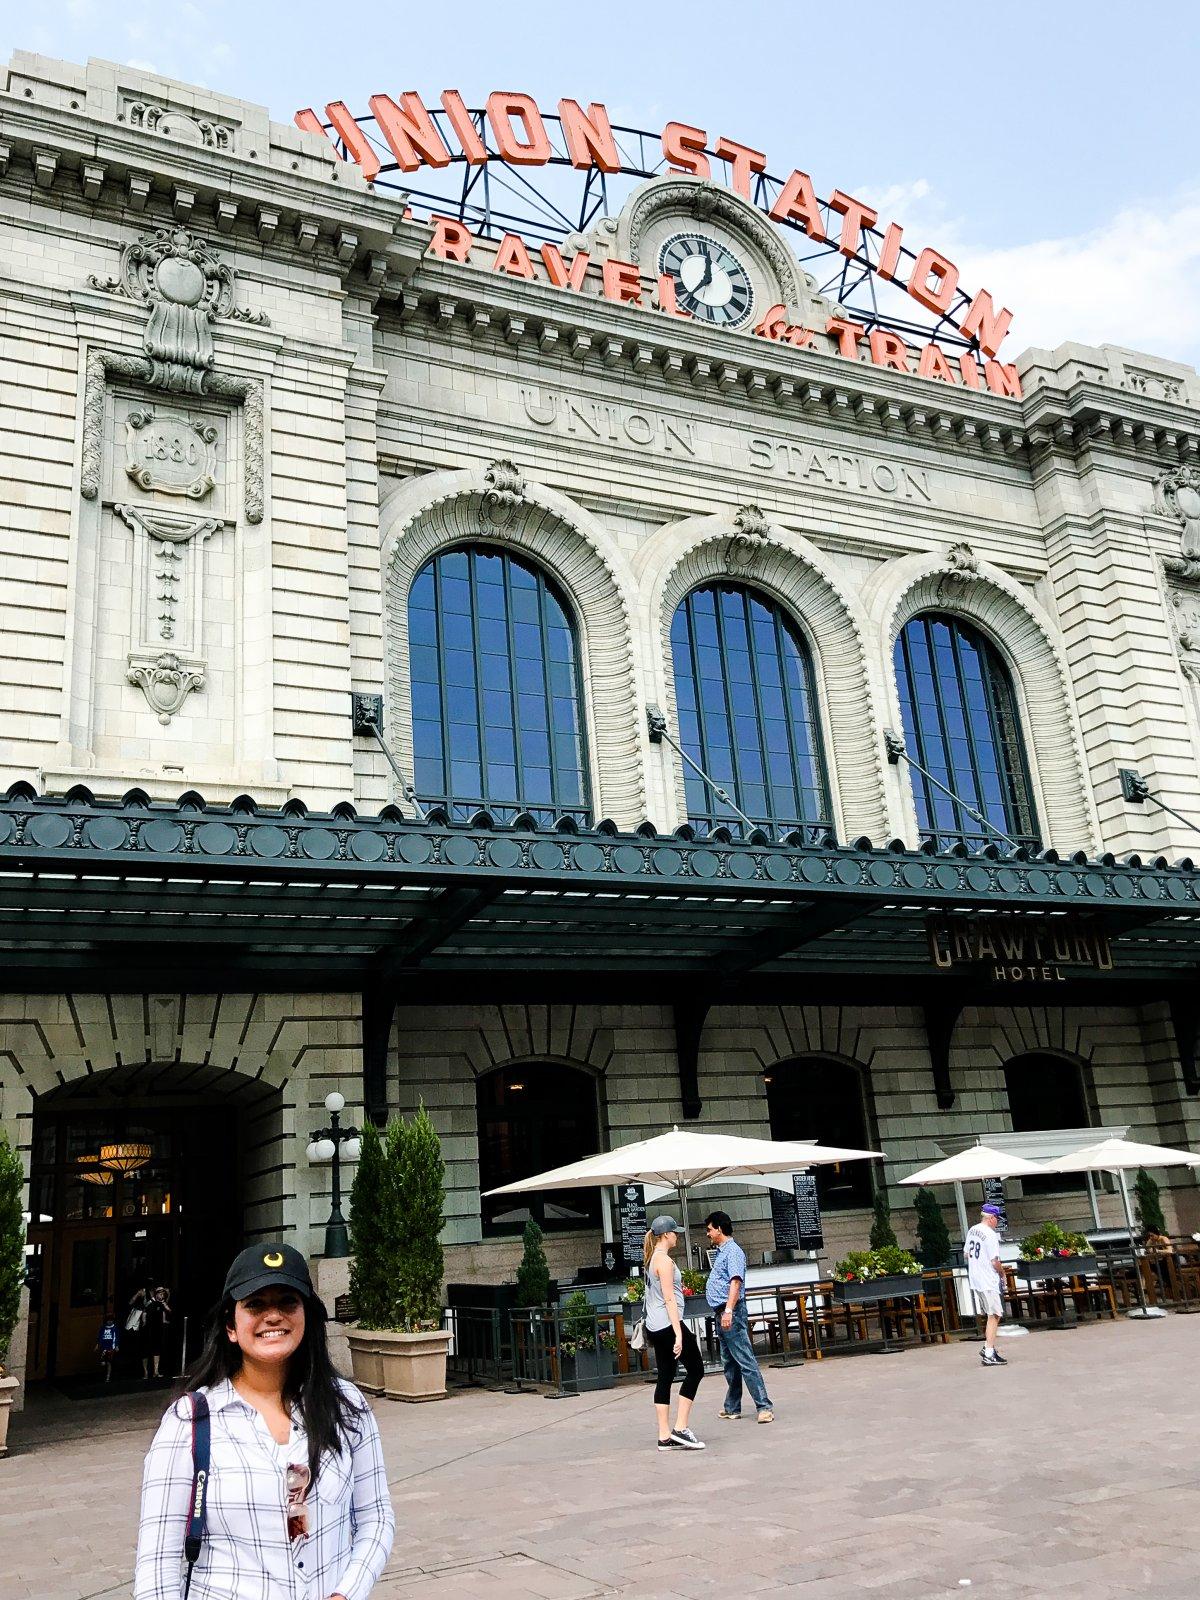 Denver Union Station Front